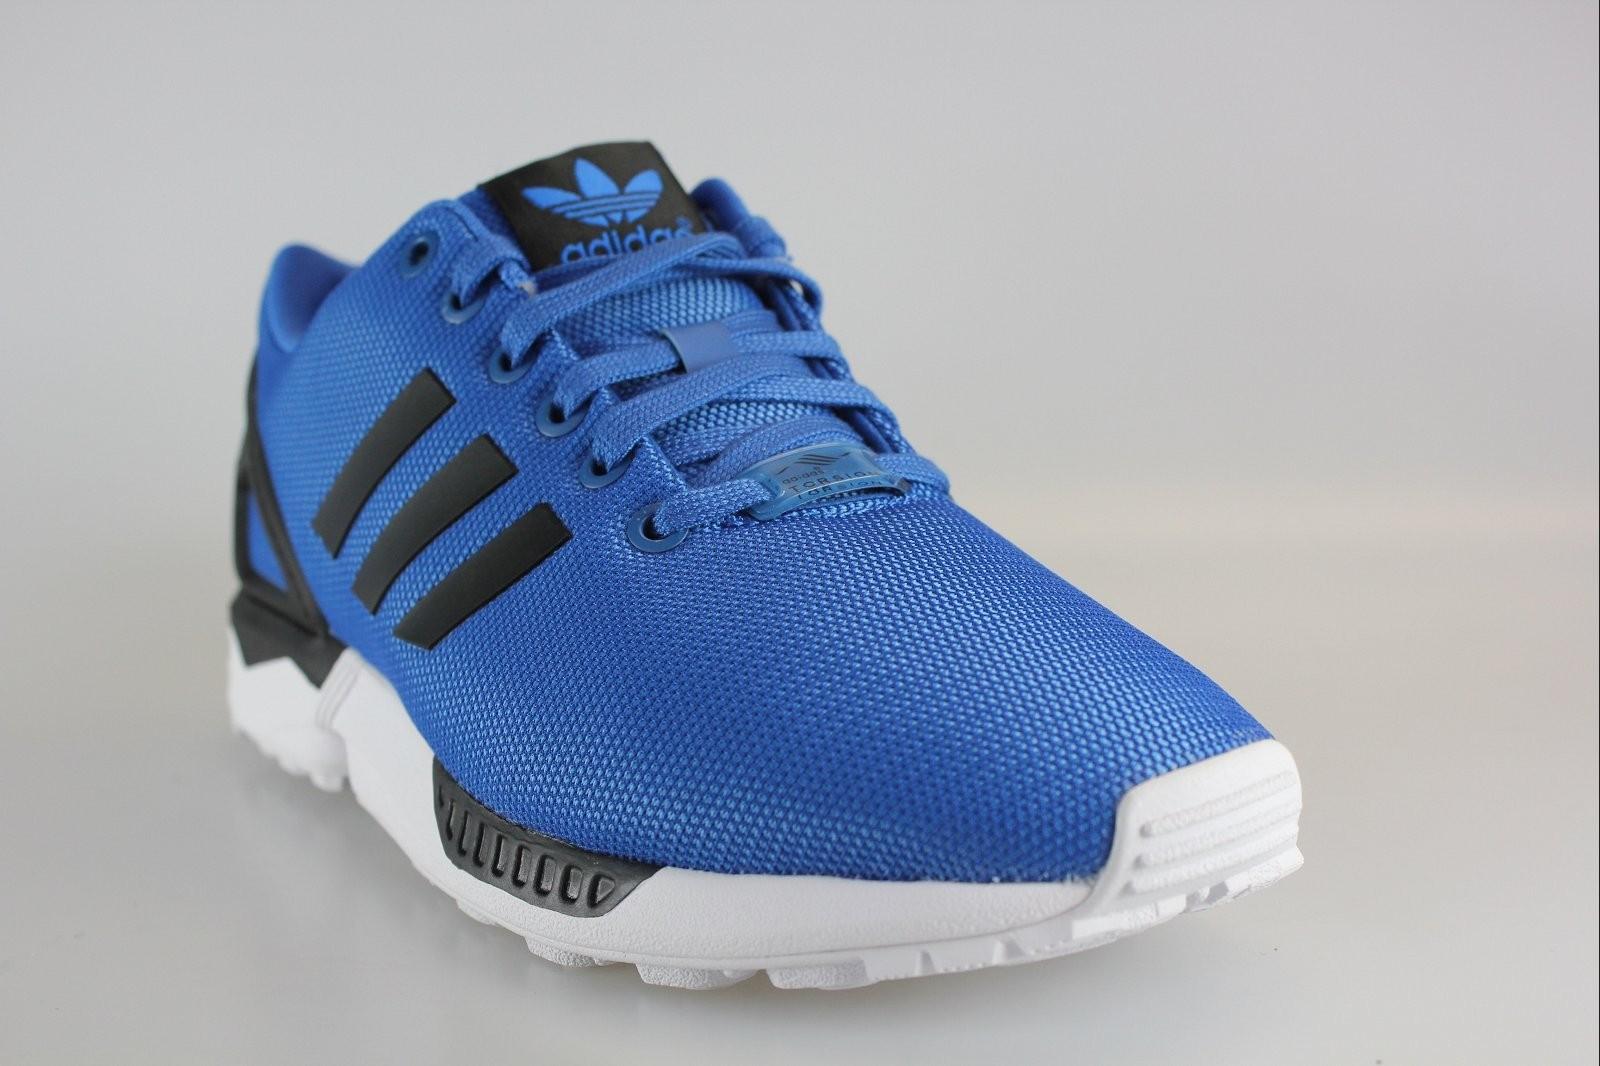 adidas zx flux bleu une vente de liquidation de prix bas